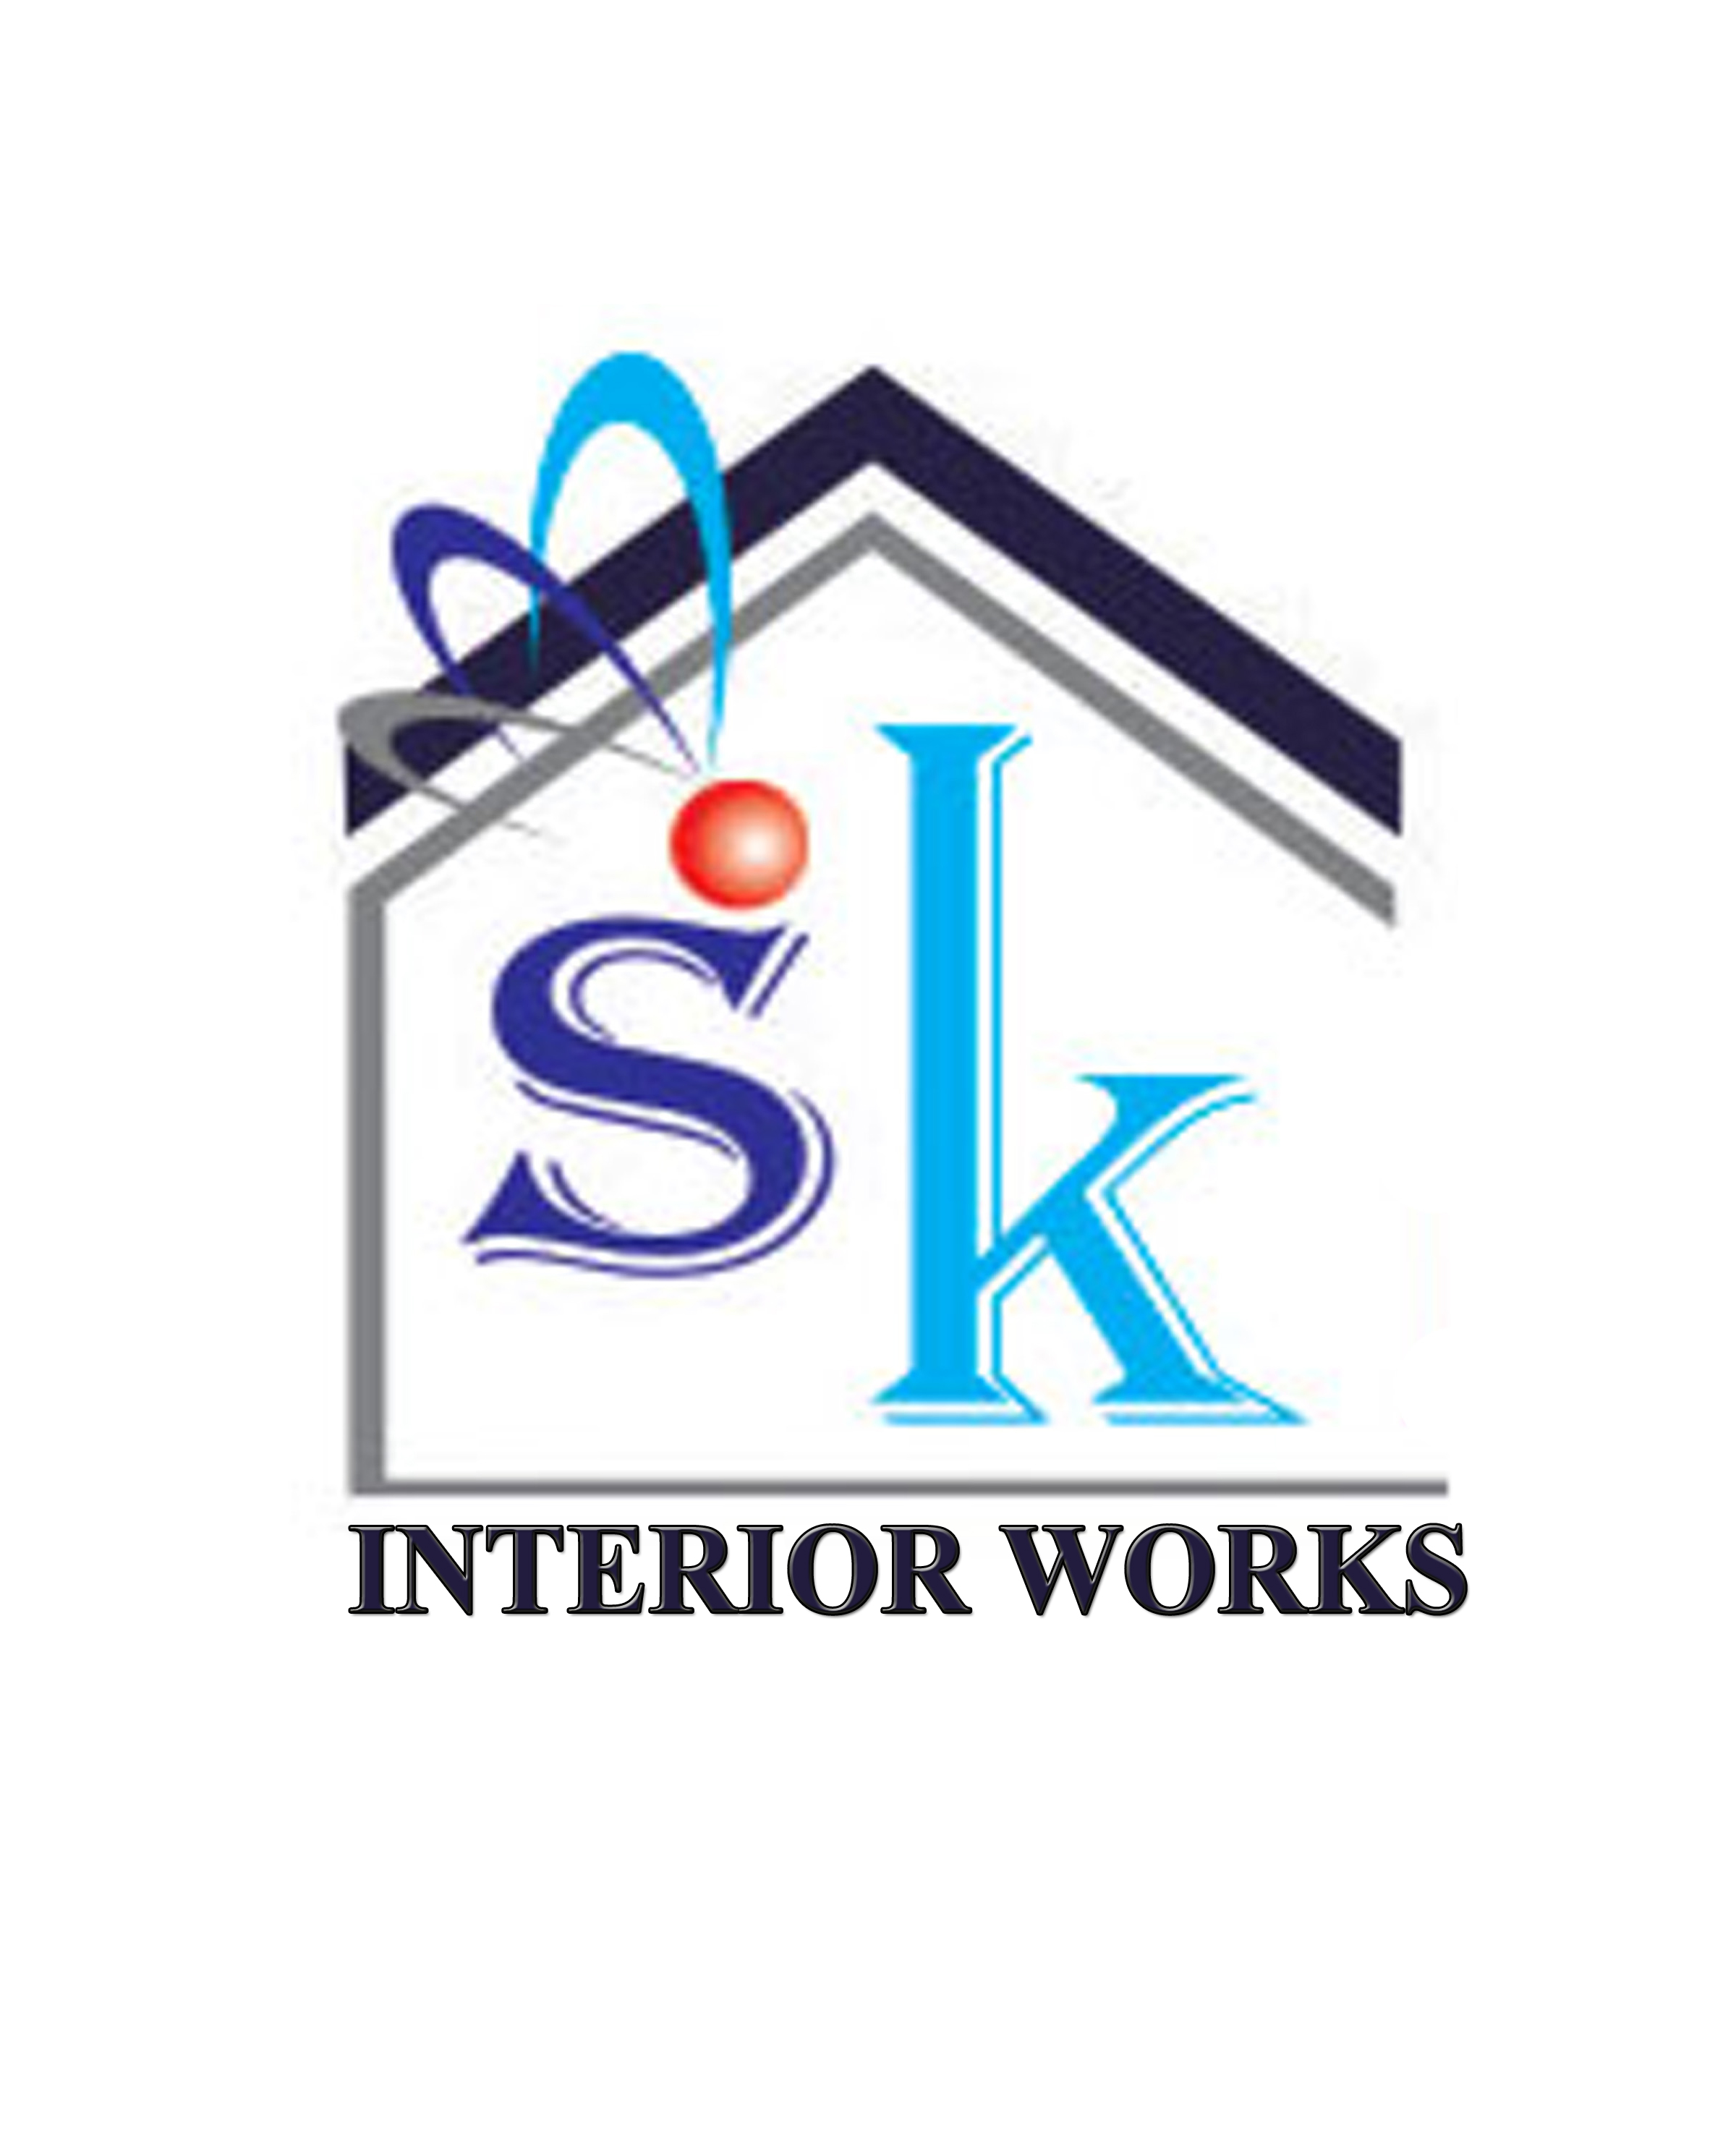 SK INTERIOR WORKS 0803018